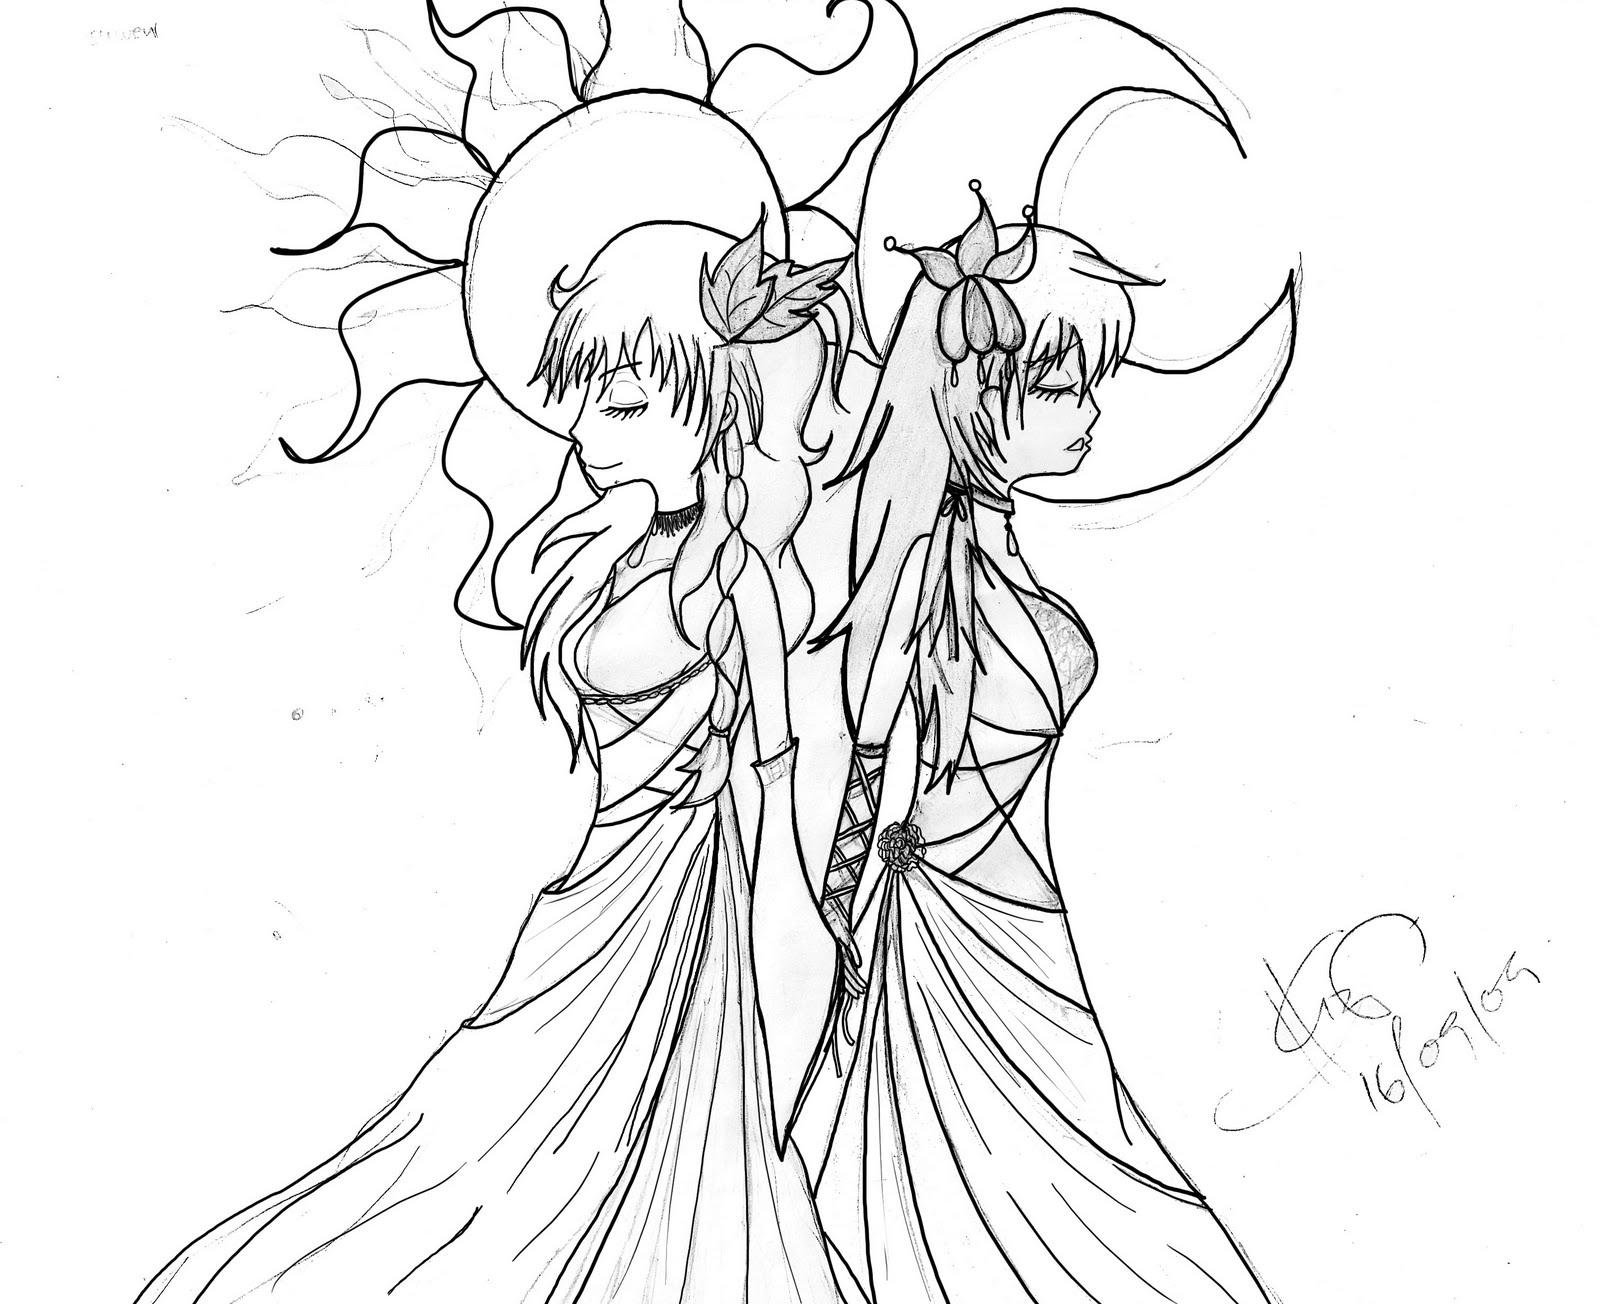 1600x1304 Insert Creativity Here] Suwen's Evil Anime